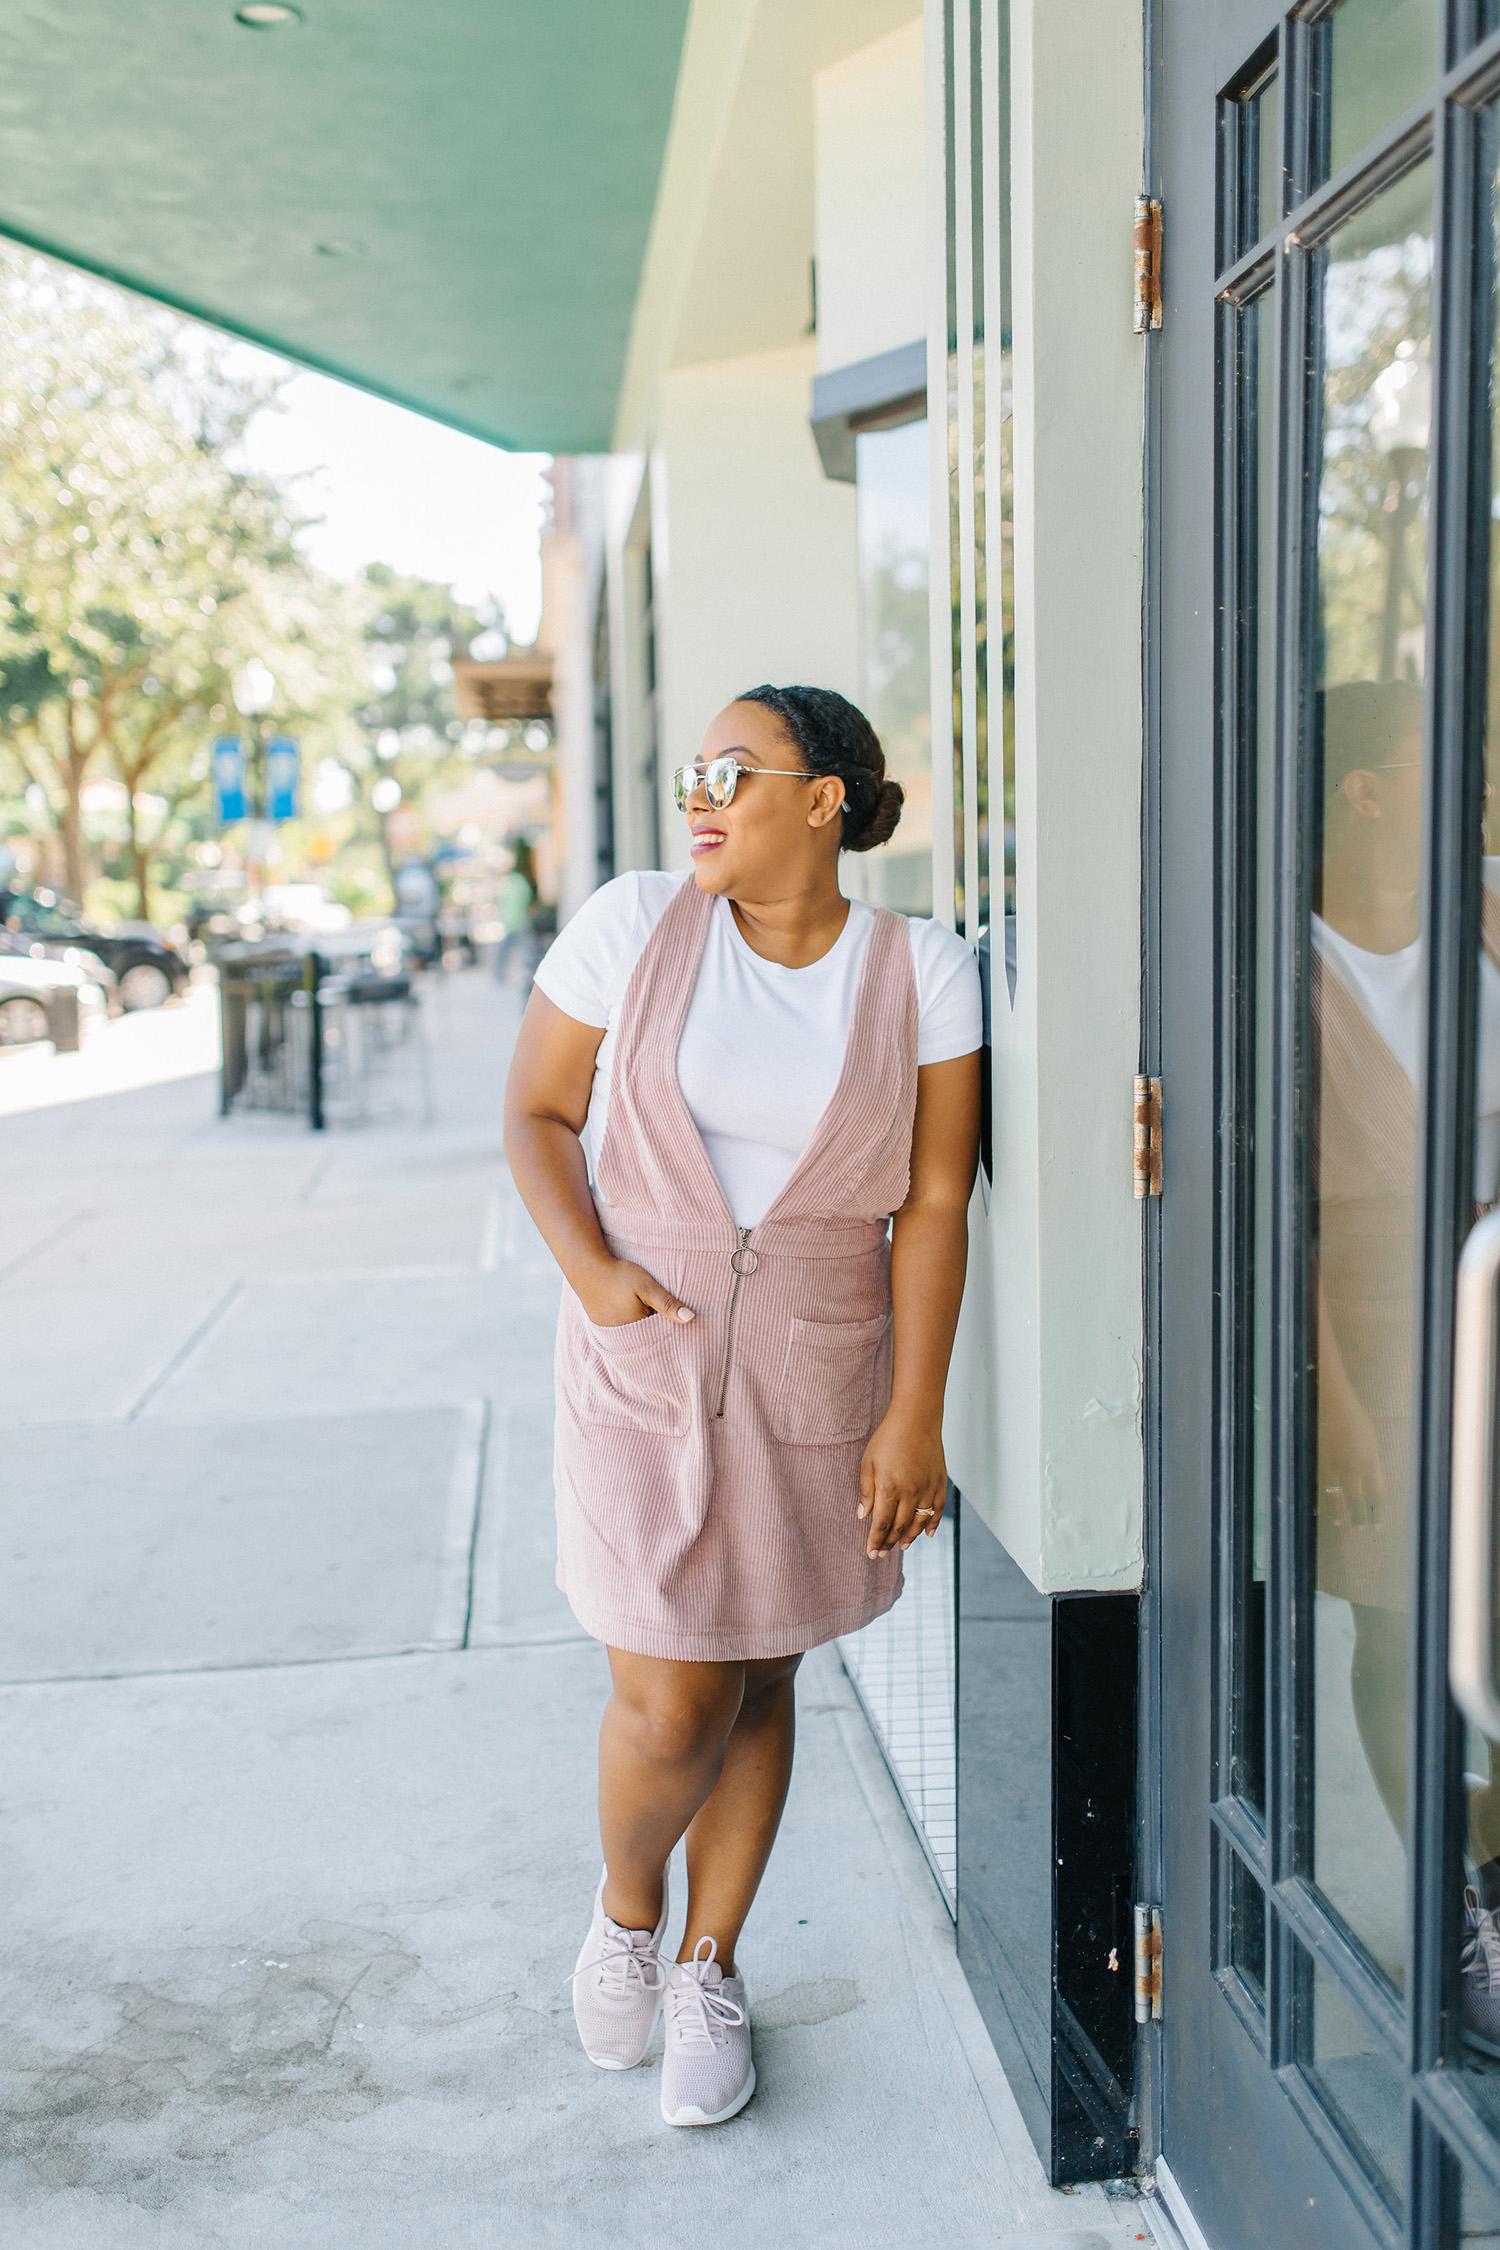 Orlando fashion blogger Bianca Dottin